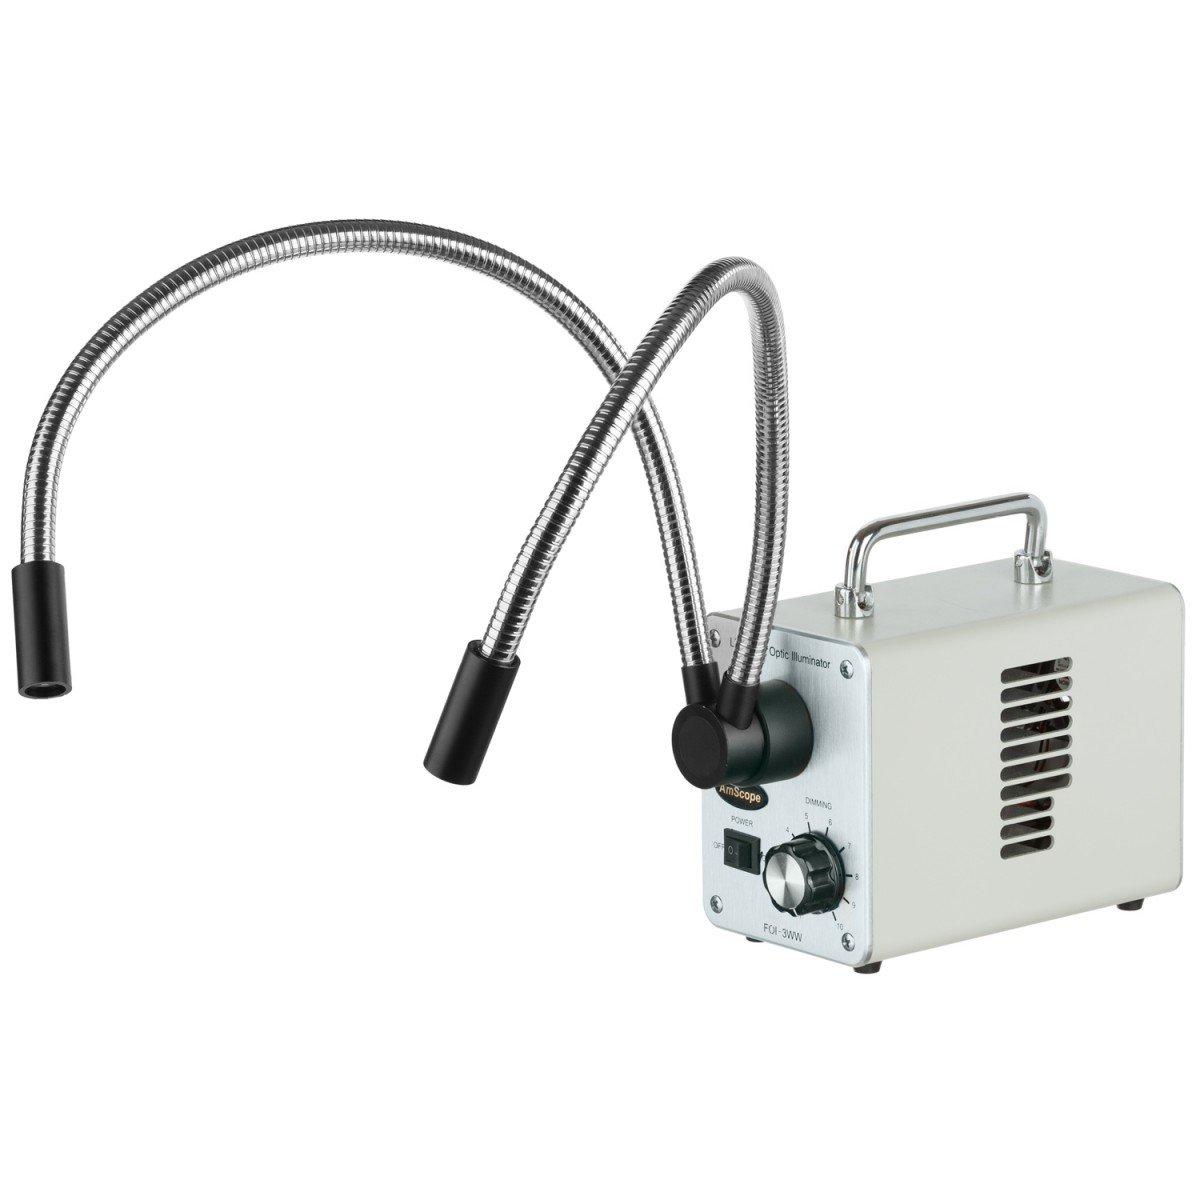 1.3MP USB2.0 Camera AmScope 3.5X-90X Zoom Stereo Trinocular Microscope on Dual-Arm Boom Stand with Dual-Fiber-Optic LED Illuminator